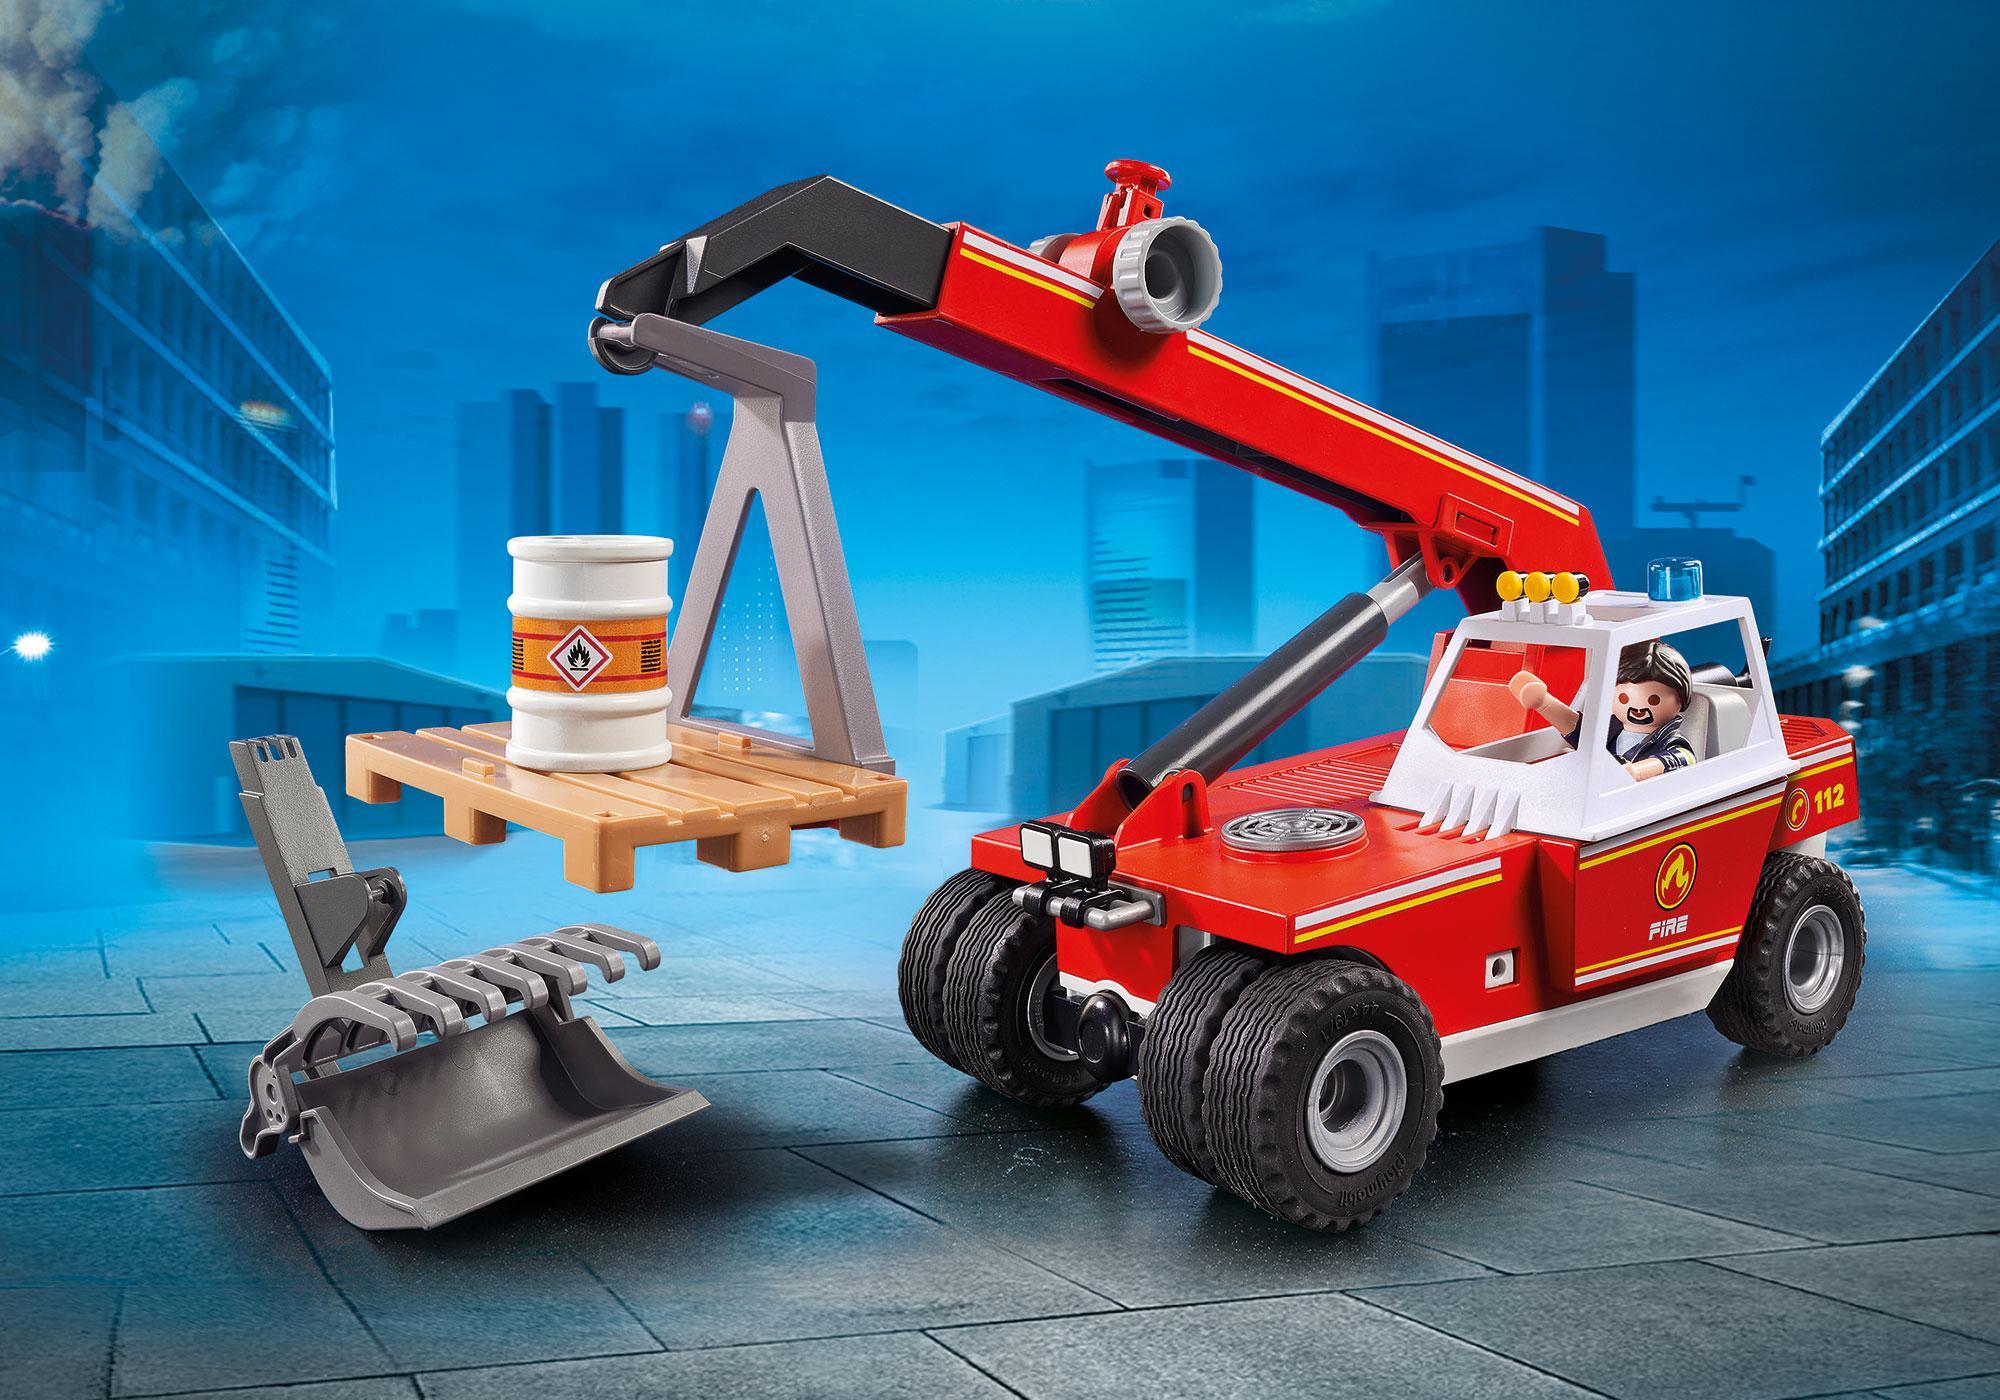 9465_product_detail/Fire Crane